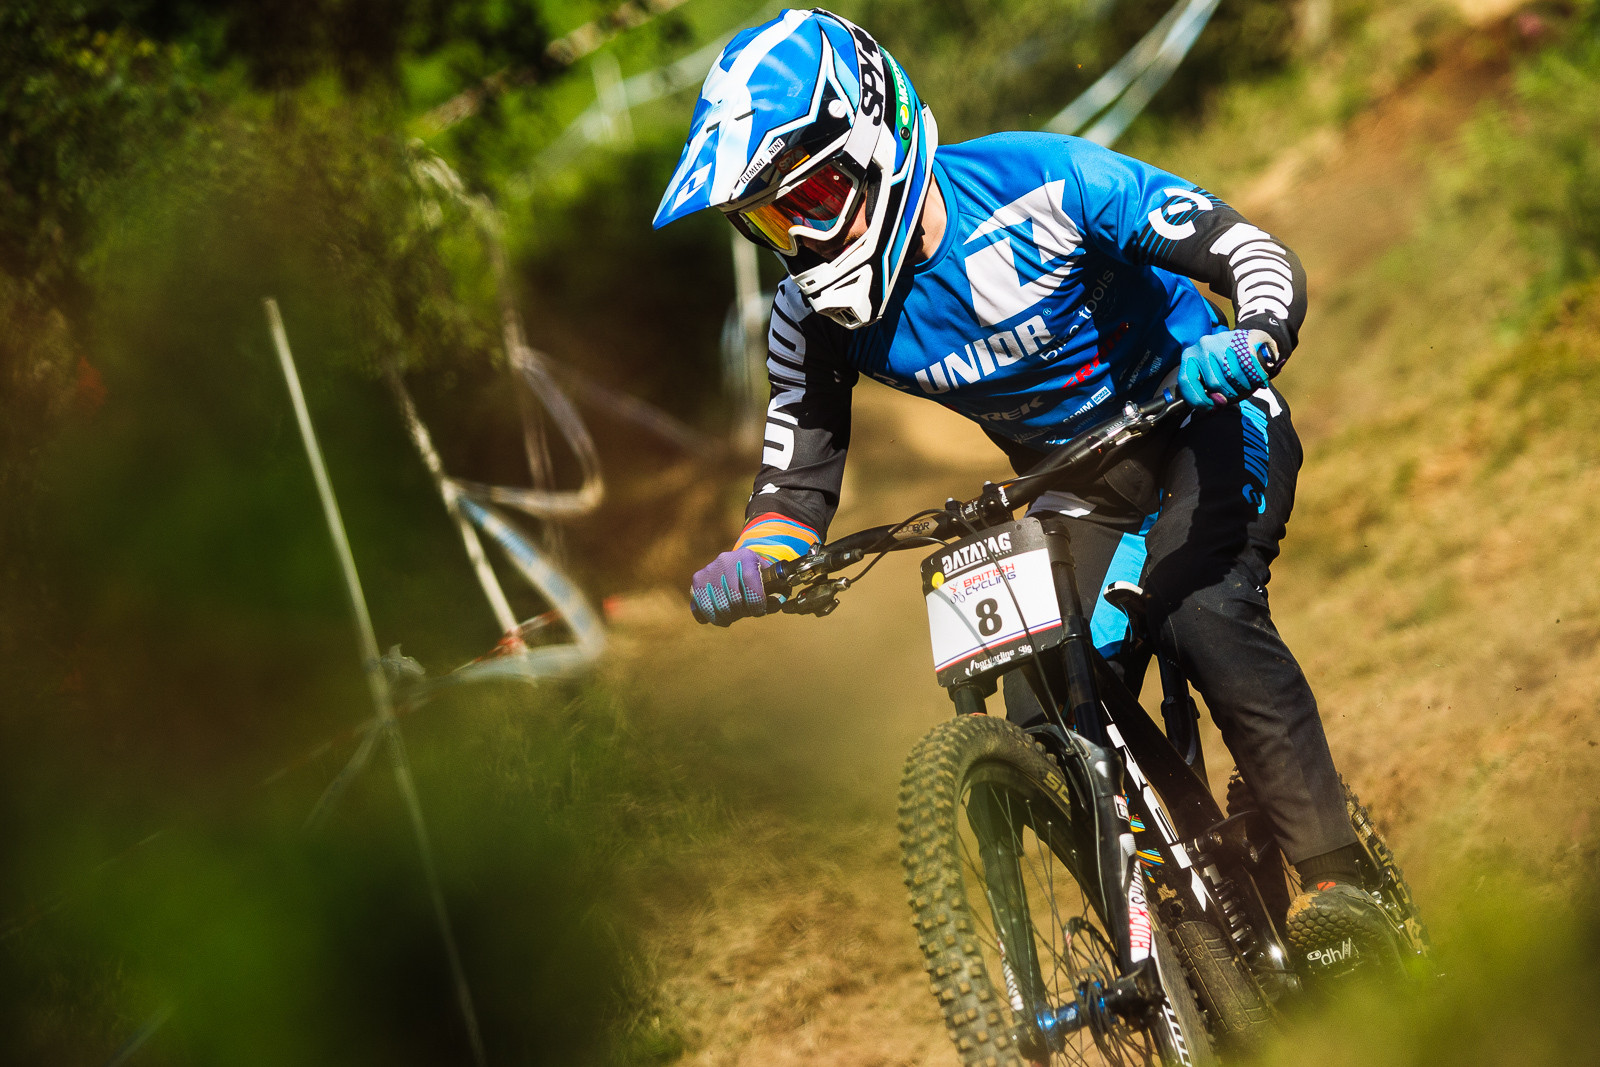 Ruaridh Cunningham - 2015 British National Champs Downhill - 2015 British National Champs Downhill Photos - Mountain Biking Pictures - Vital MTB